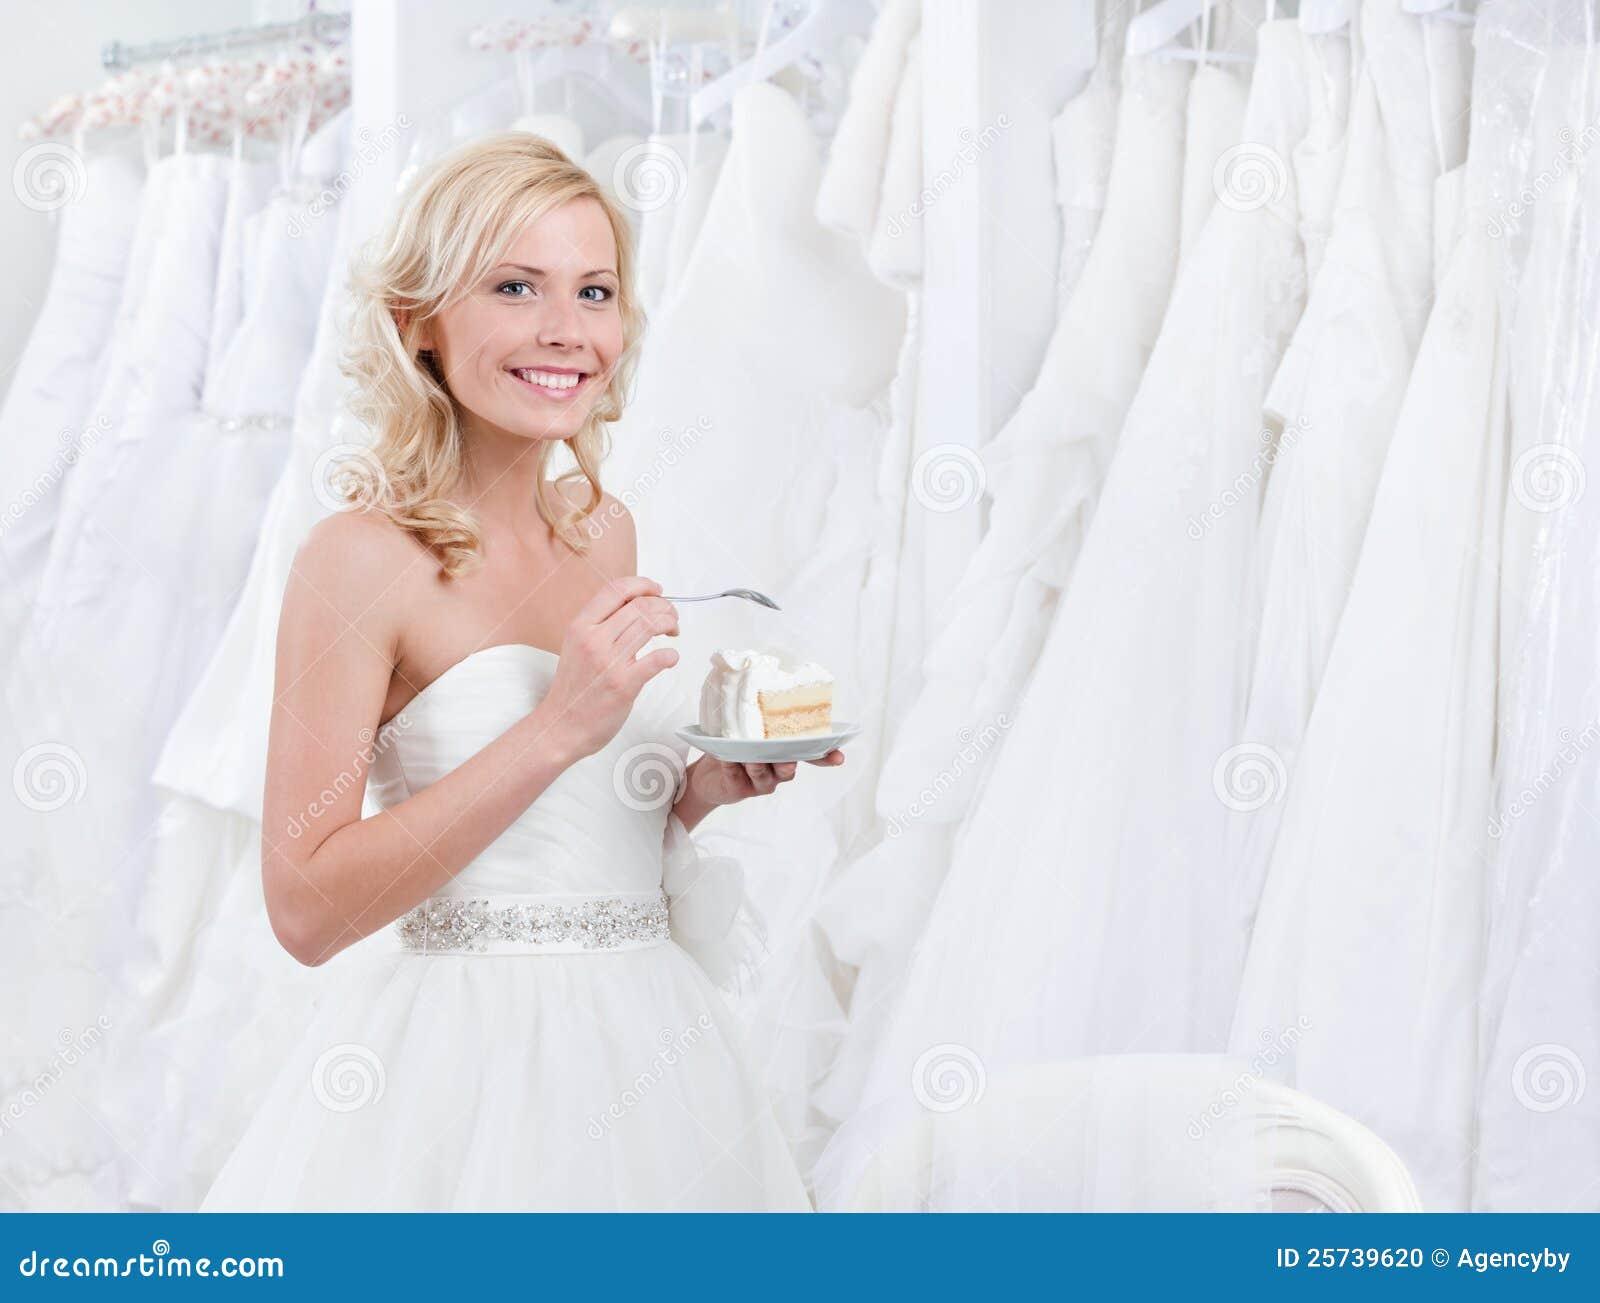 Happy bride tastes the cake